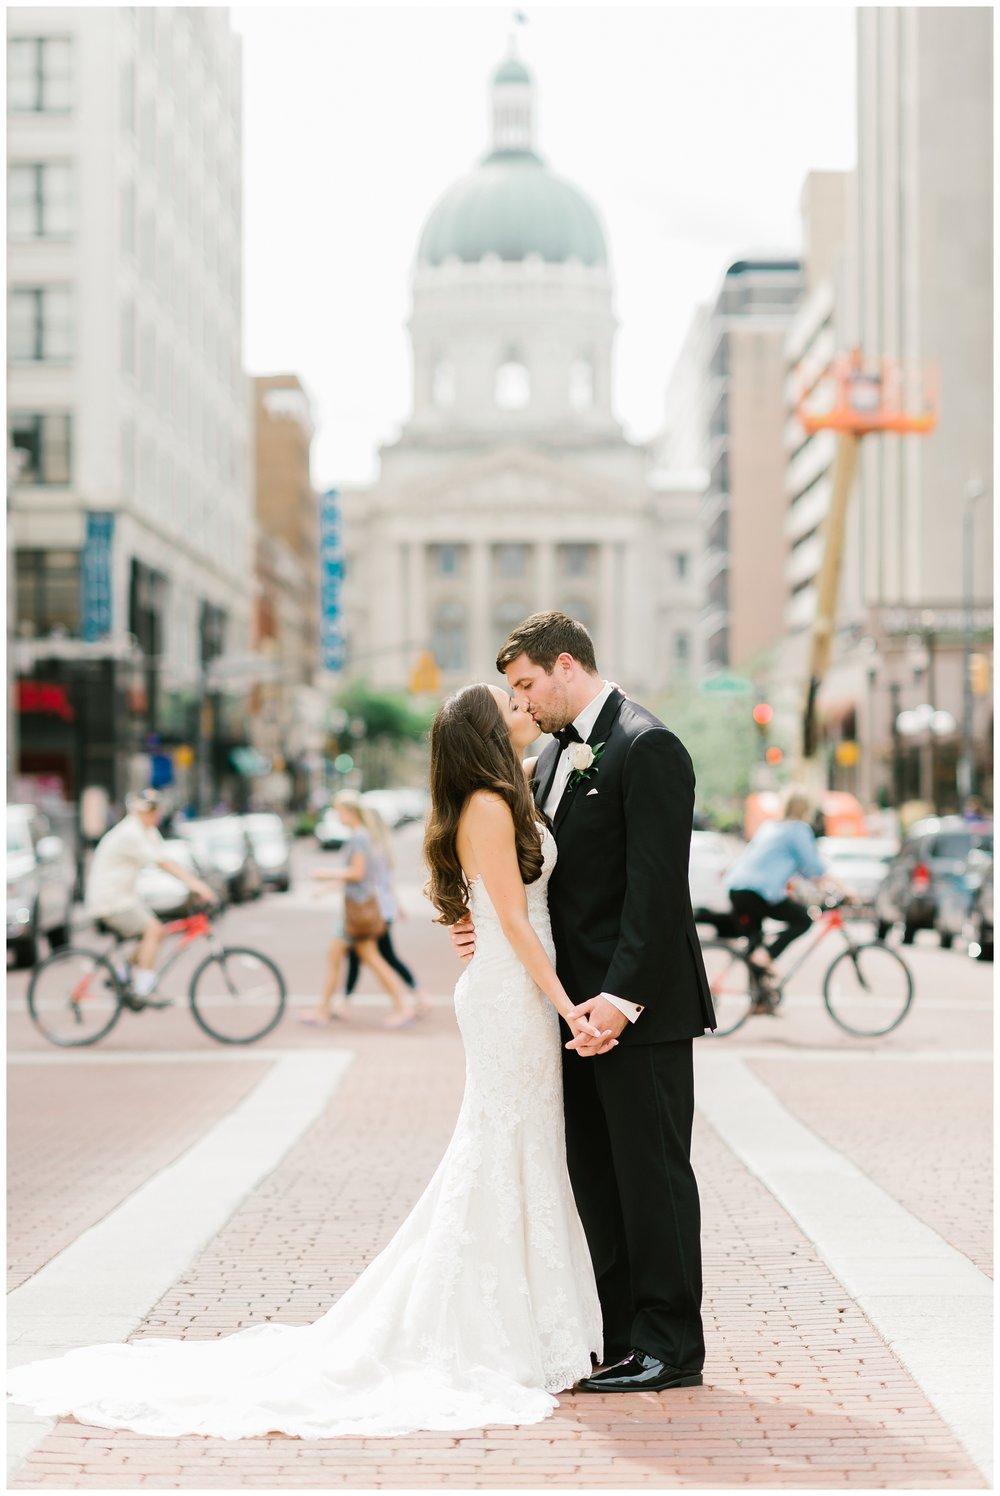 Rebecca_Bridges_Photography_Indianapolis_Wedding_Photographer_6850.jpg